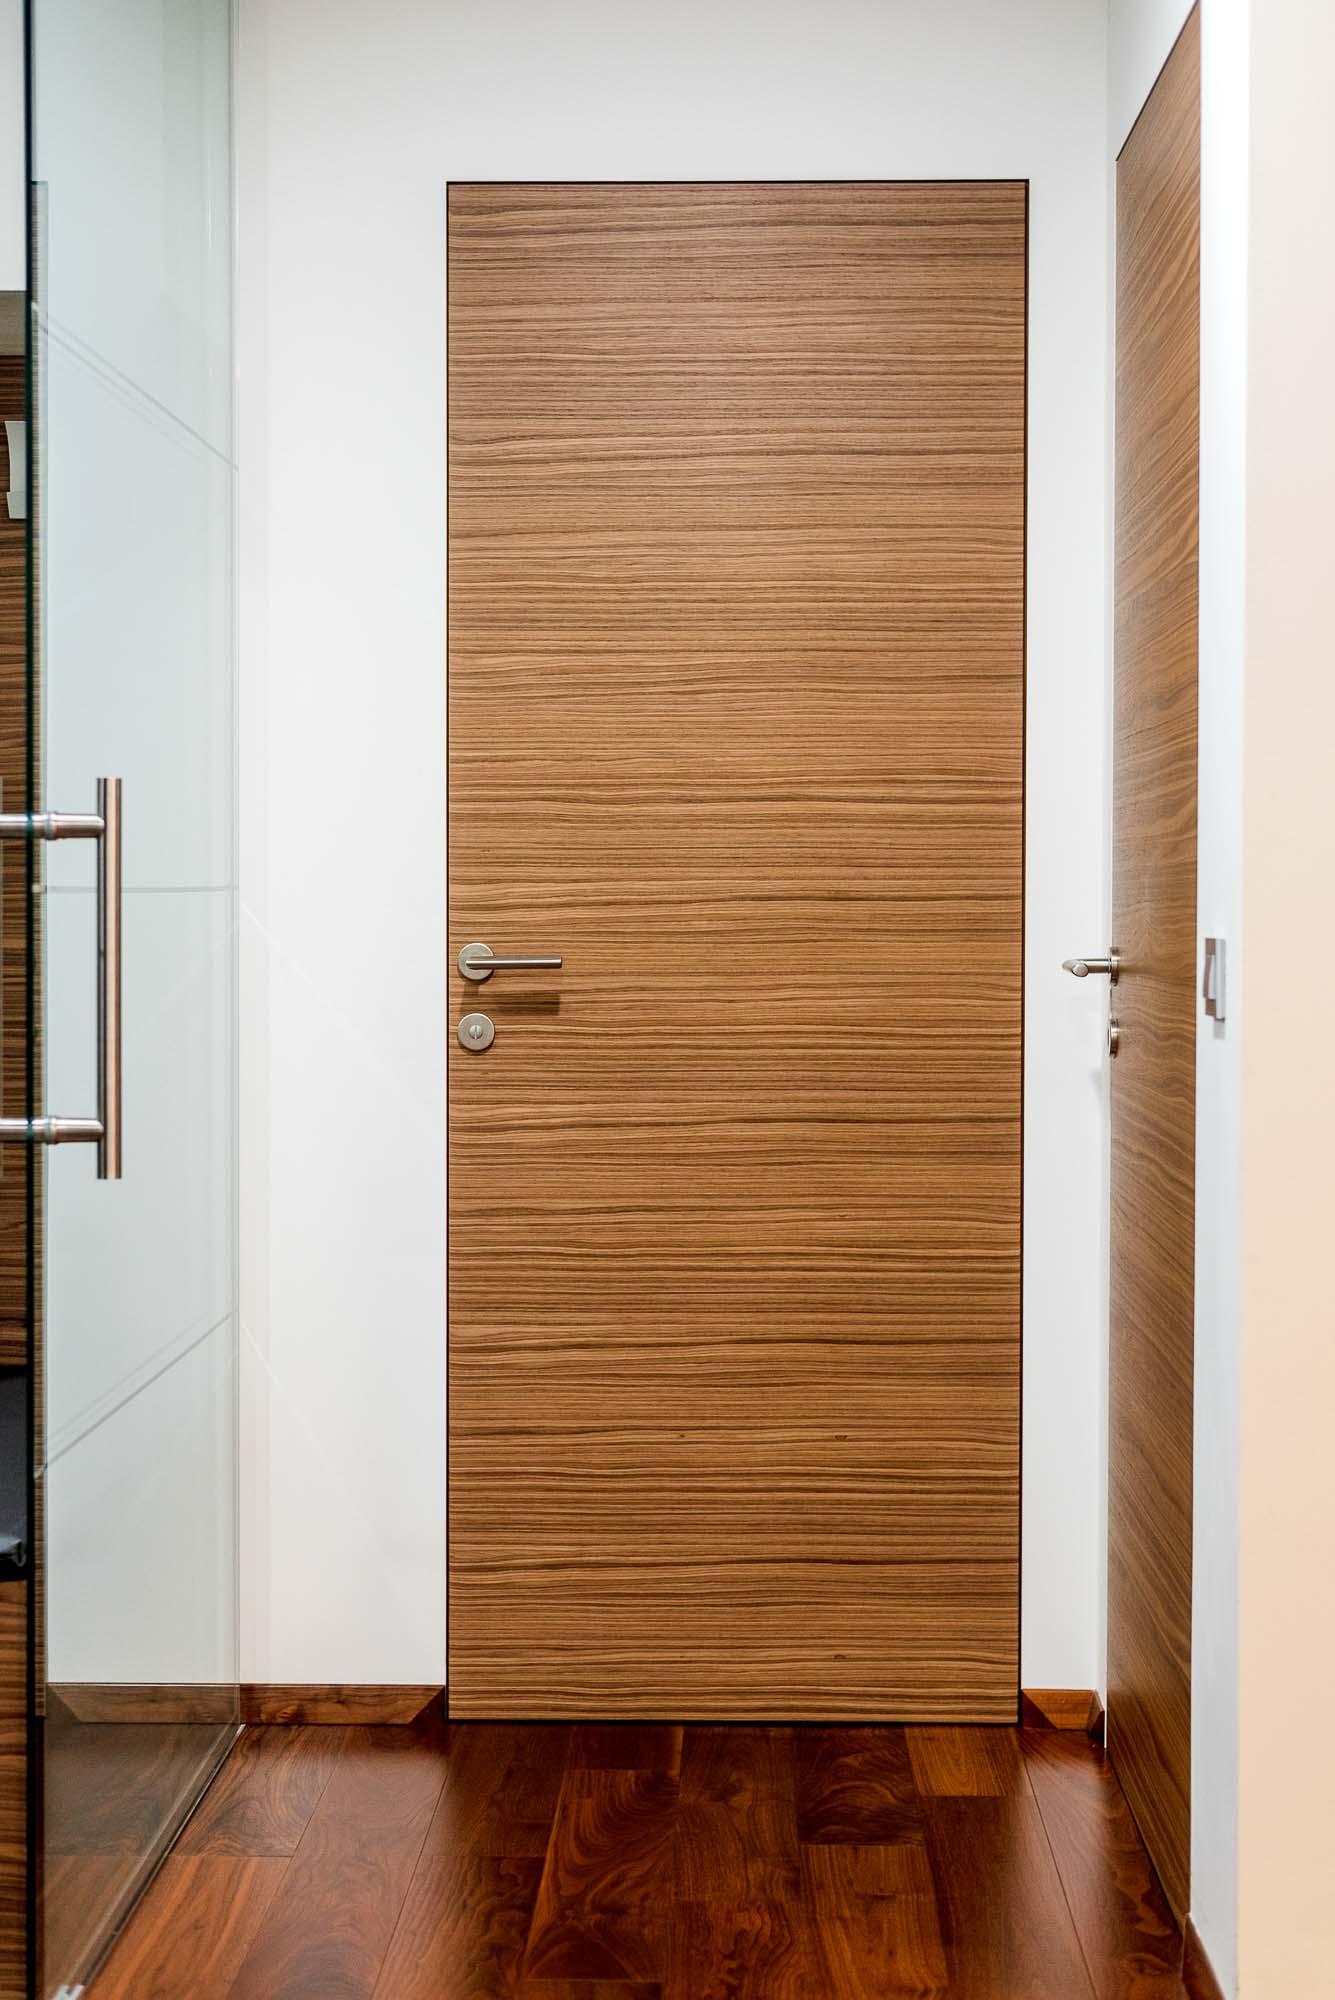 leseno kopalnisko pohistvo in kopalnica po meri